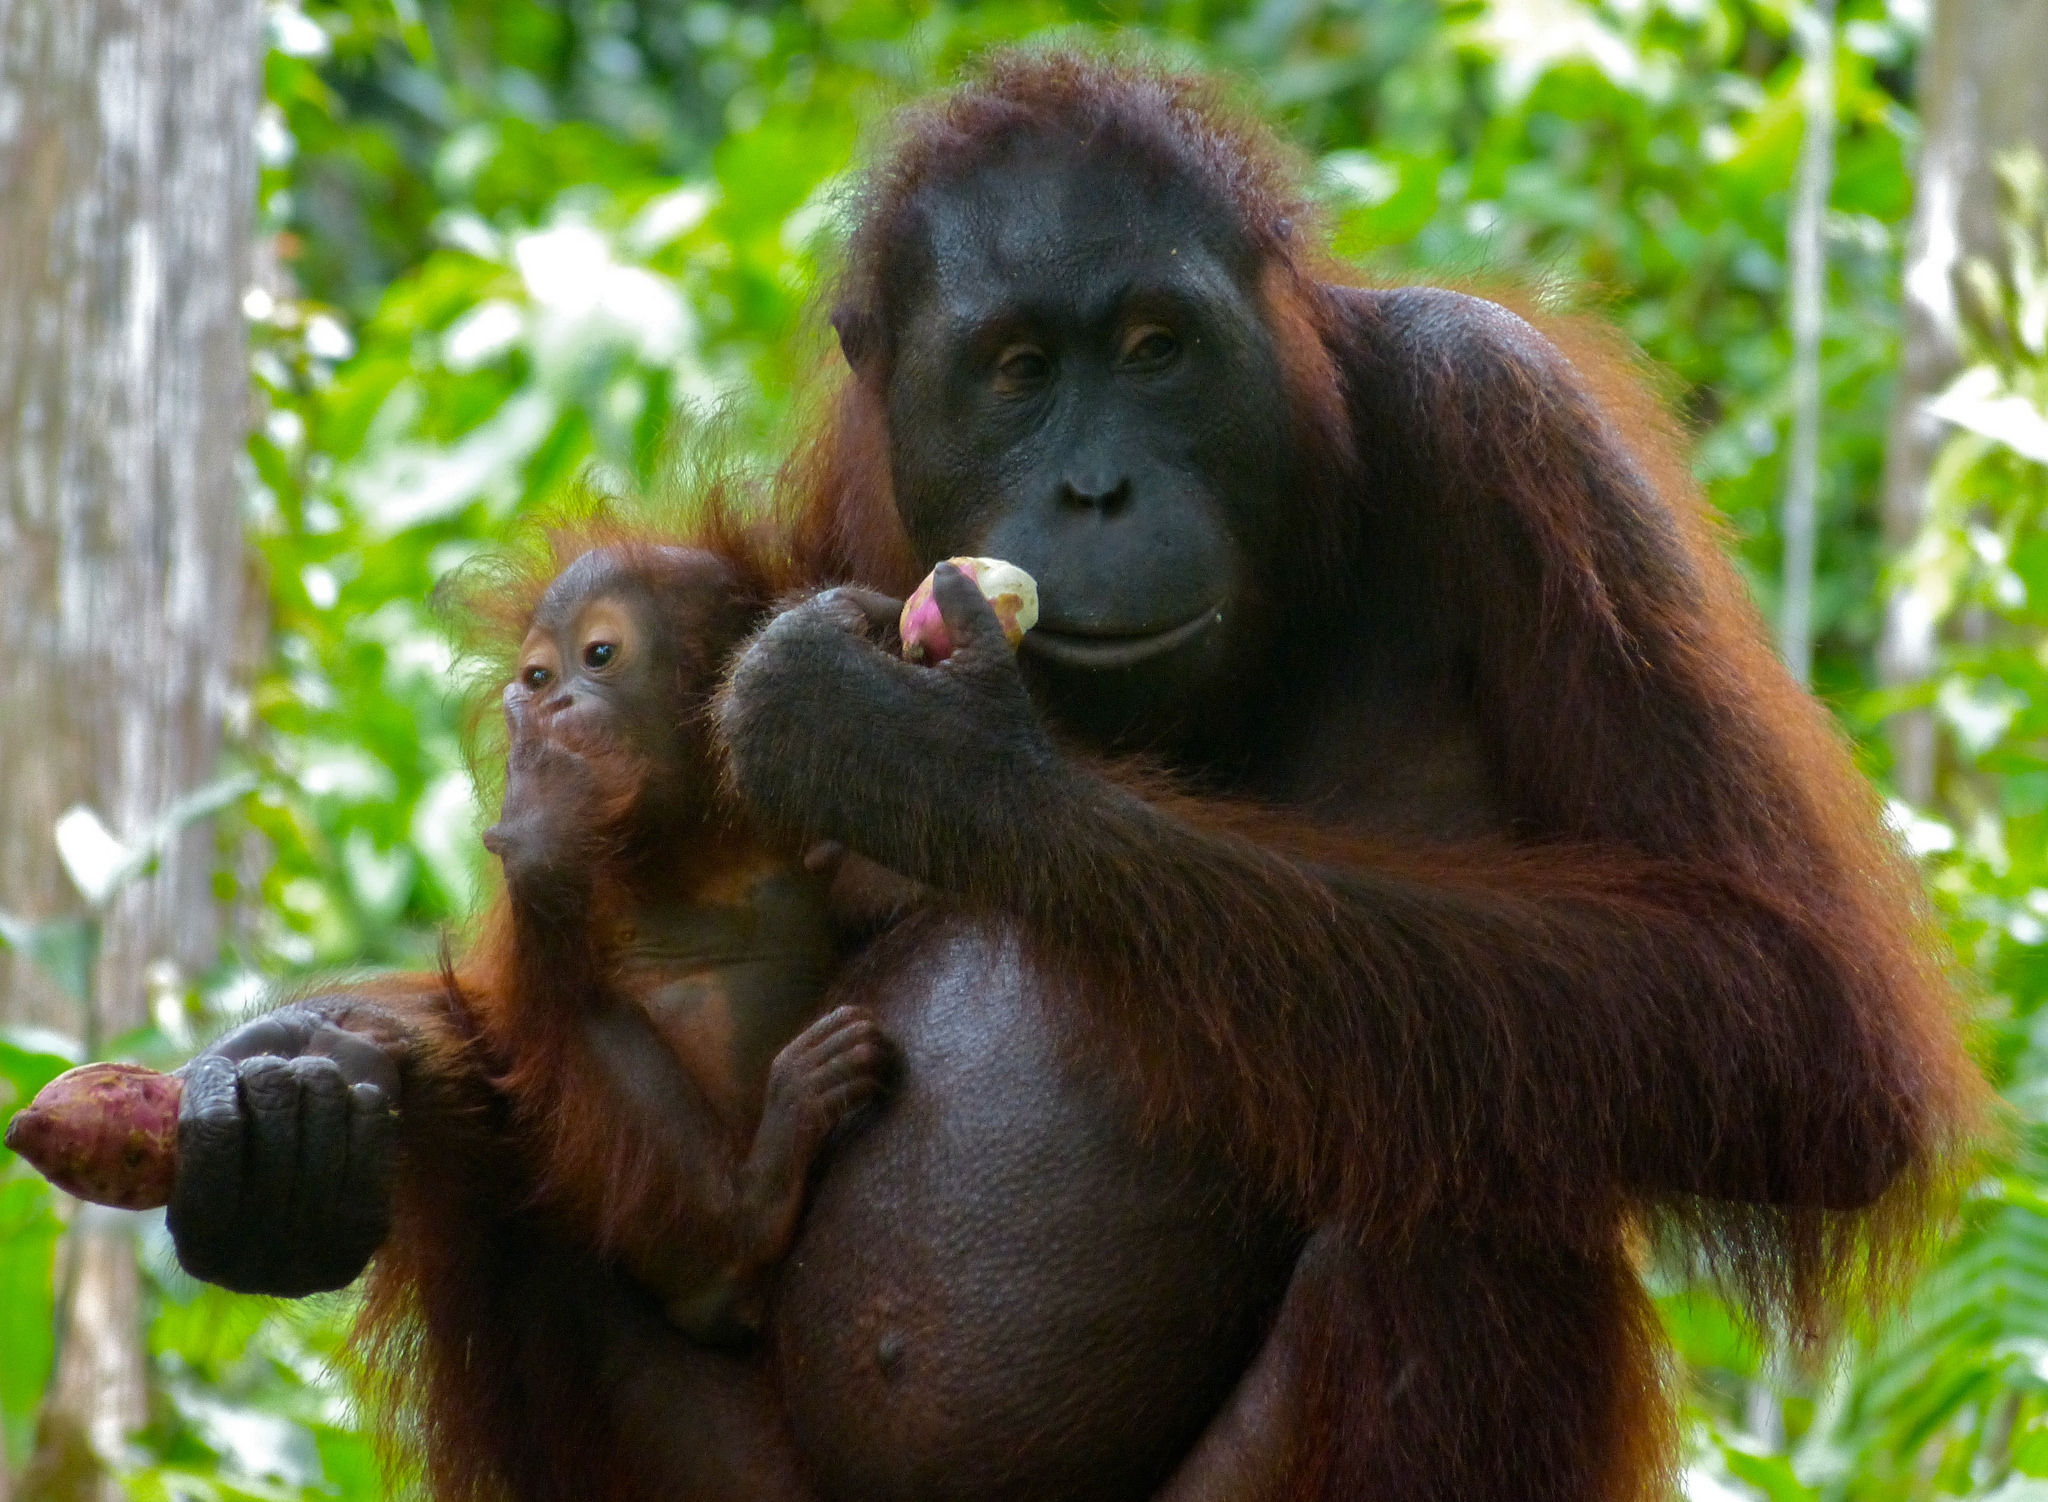 hvor lever orangutangen